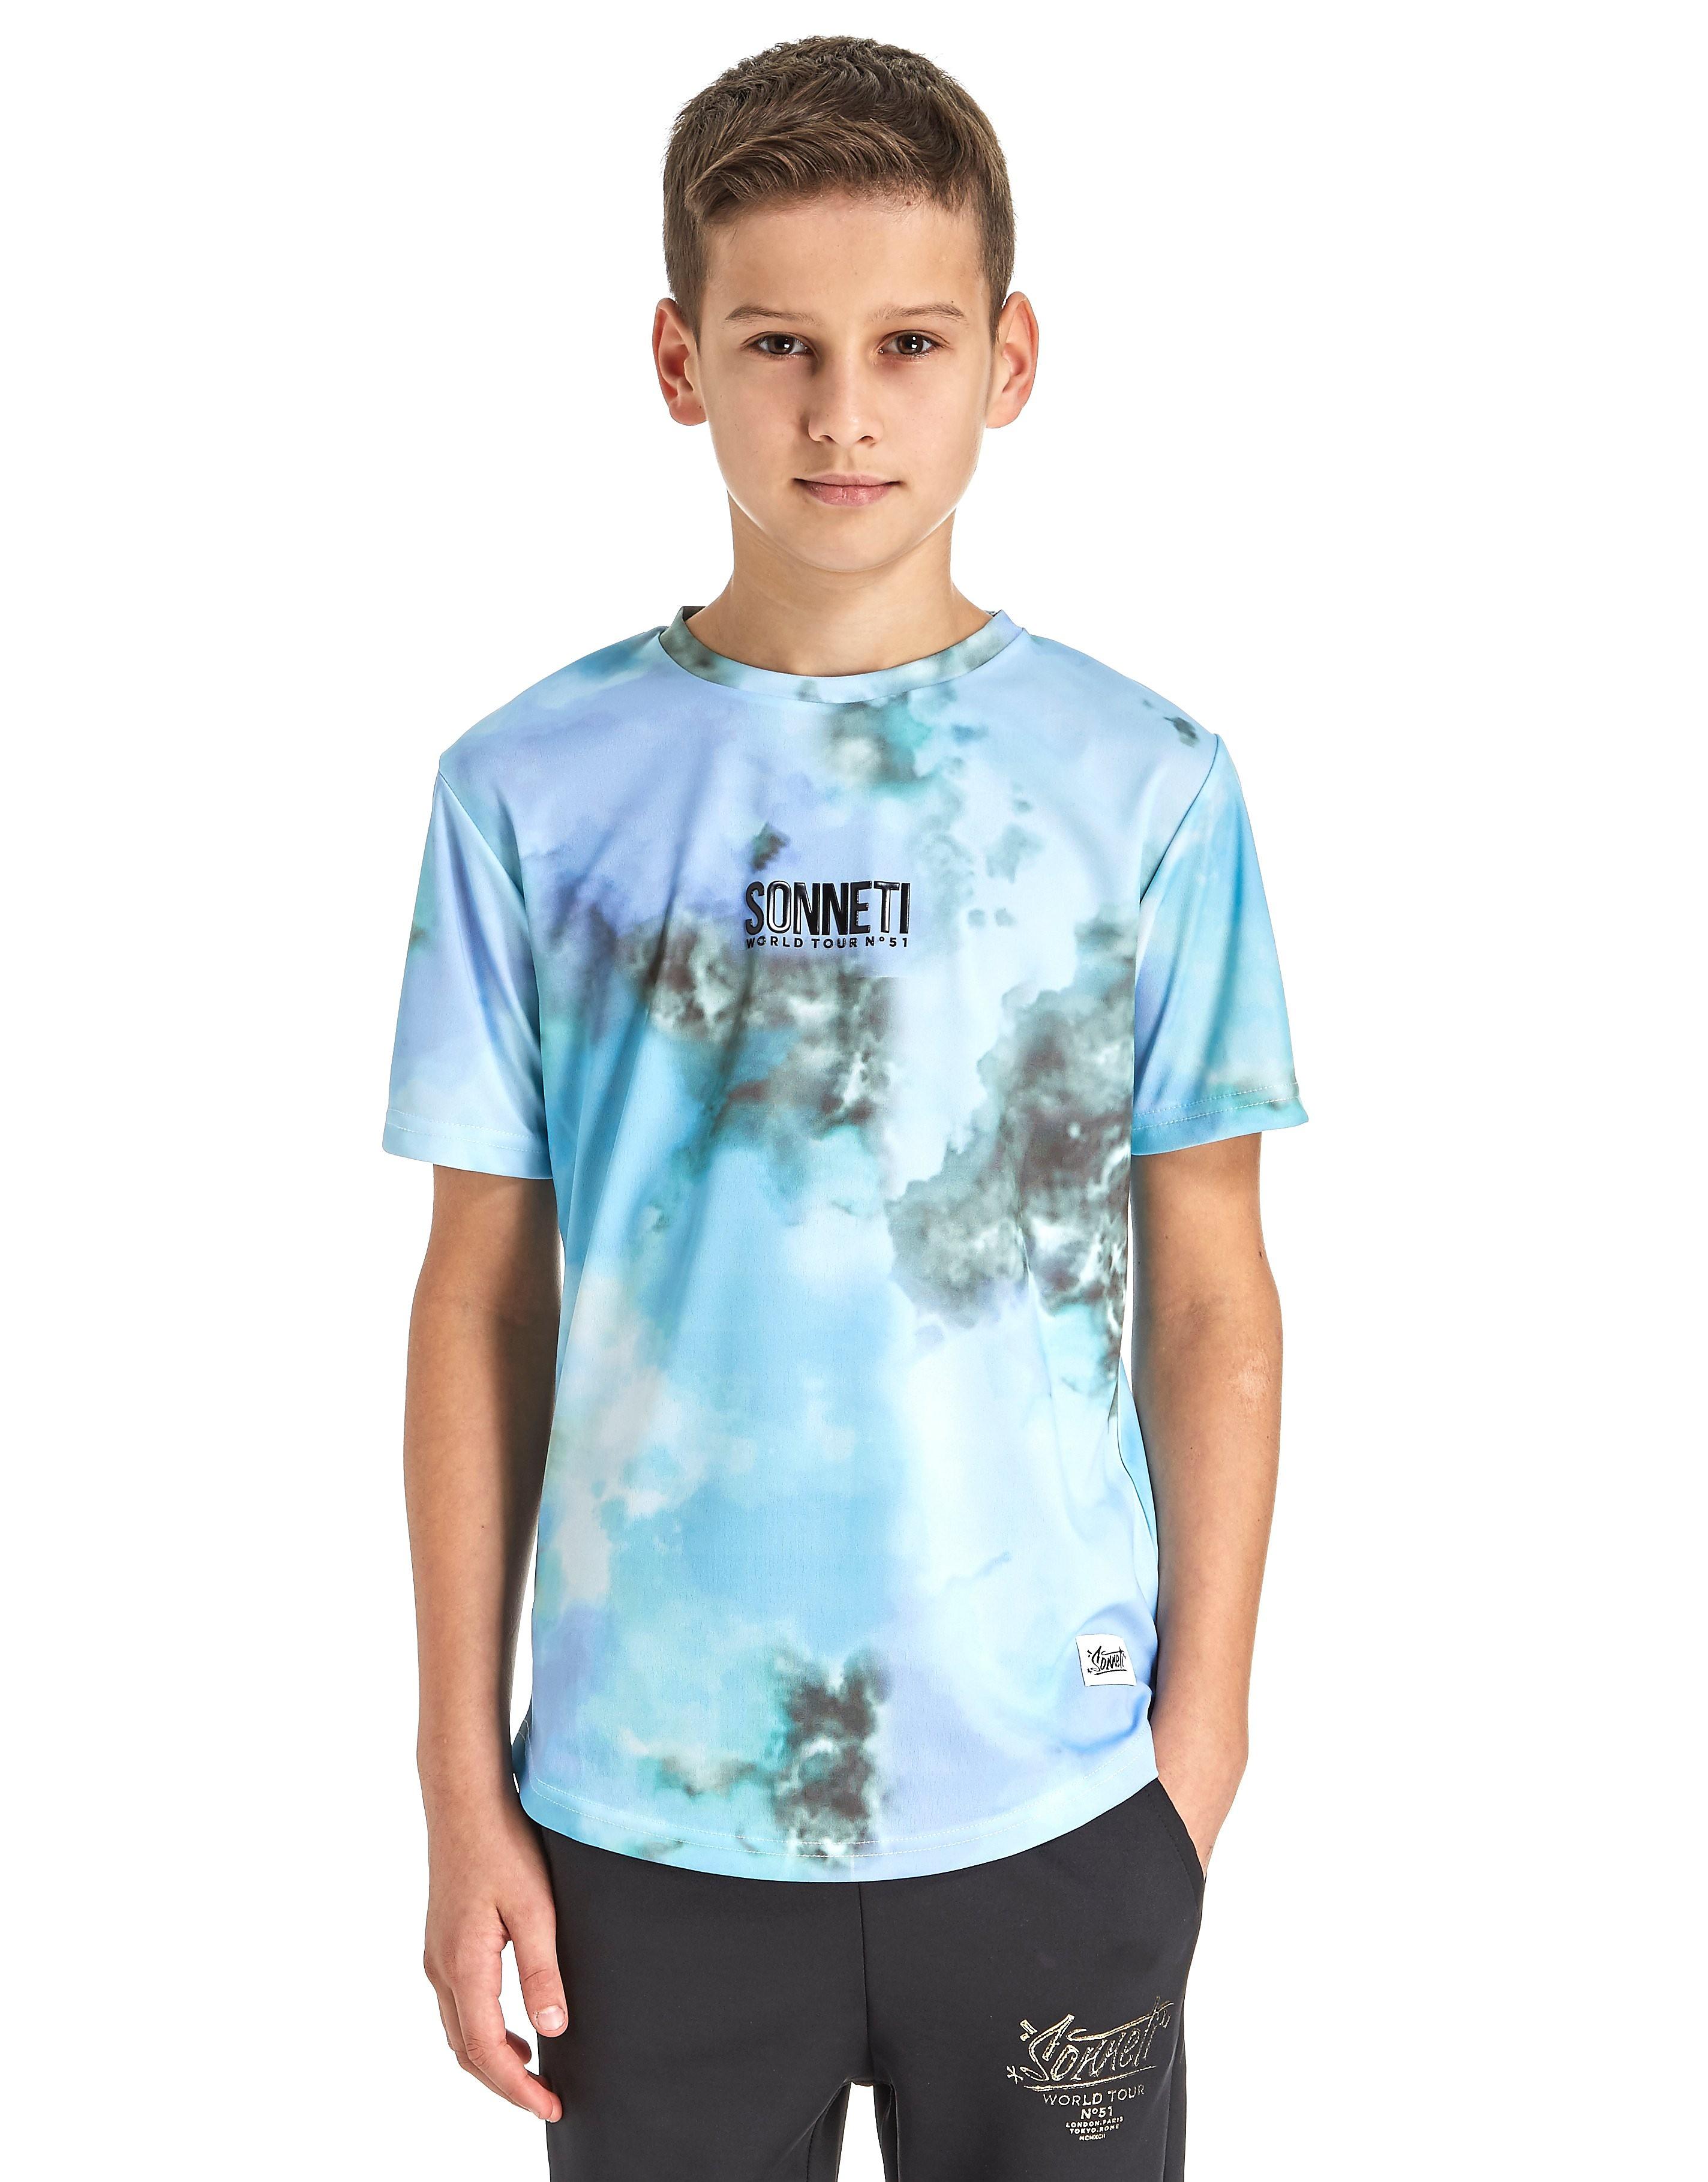 Sonneti Ward T-Shirt Junior